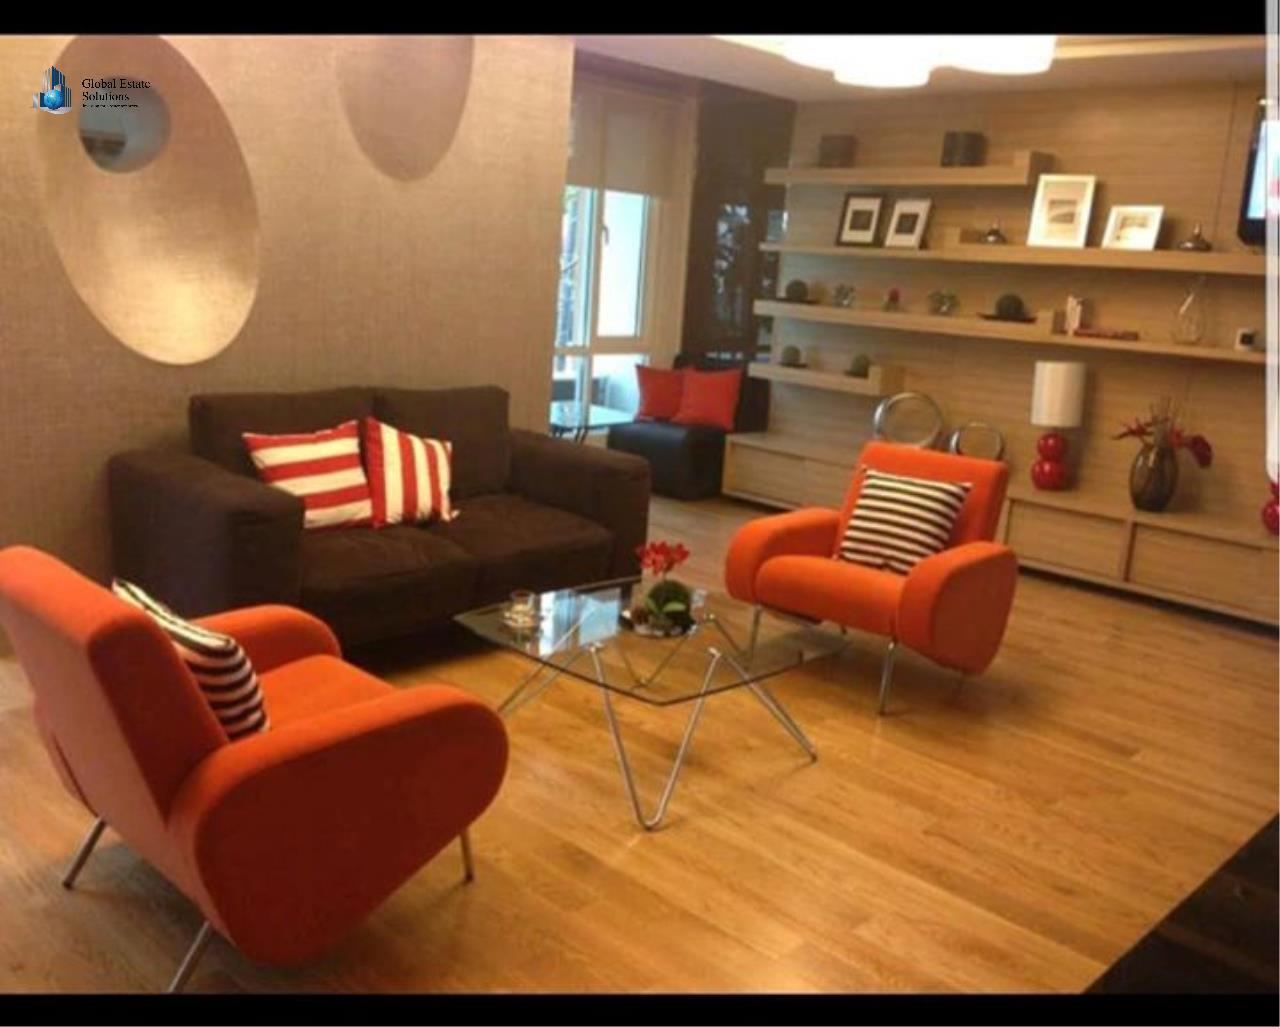 Global Estate Solutions Co., Ltd. Agency's Beverly 33 8